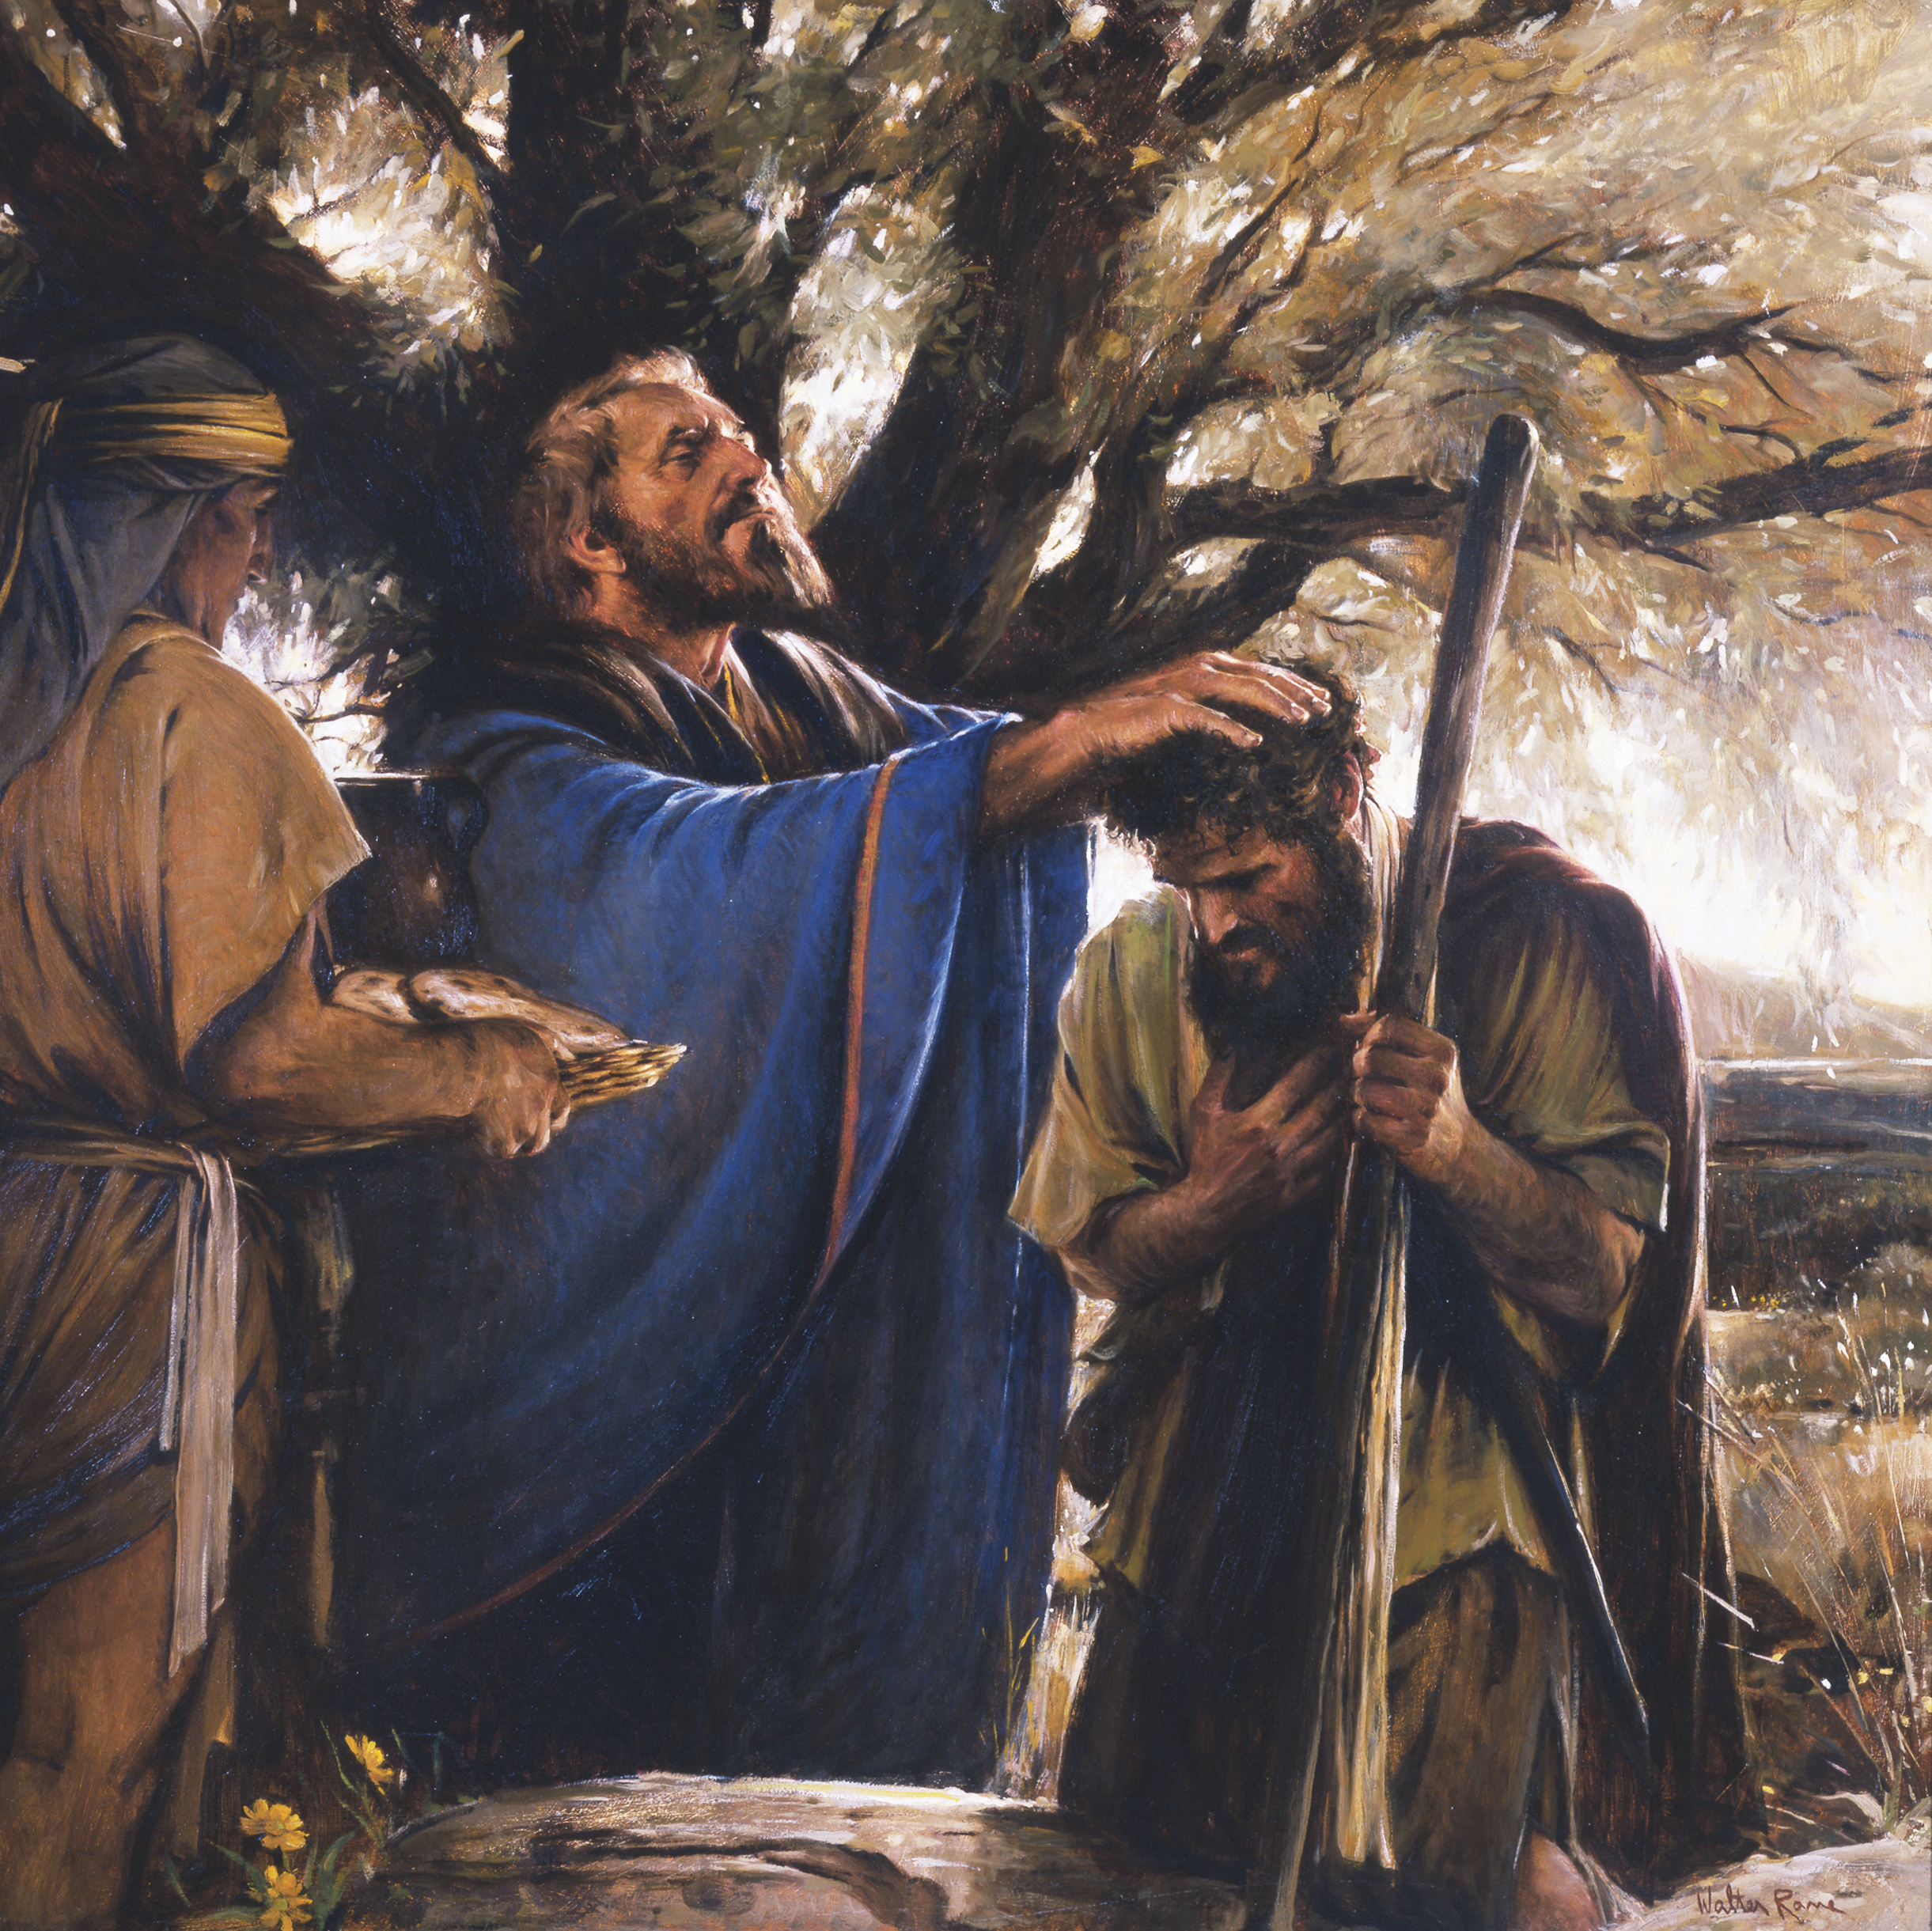 Melchizedek Blesses Abram, by Walter Rane